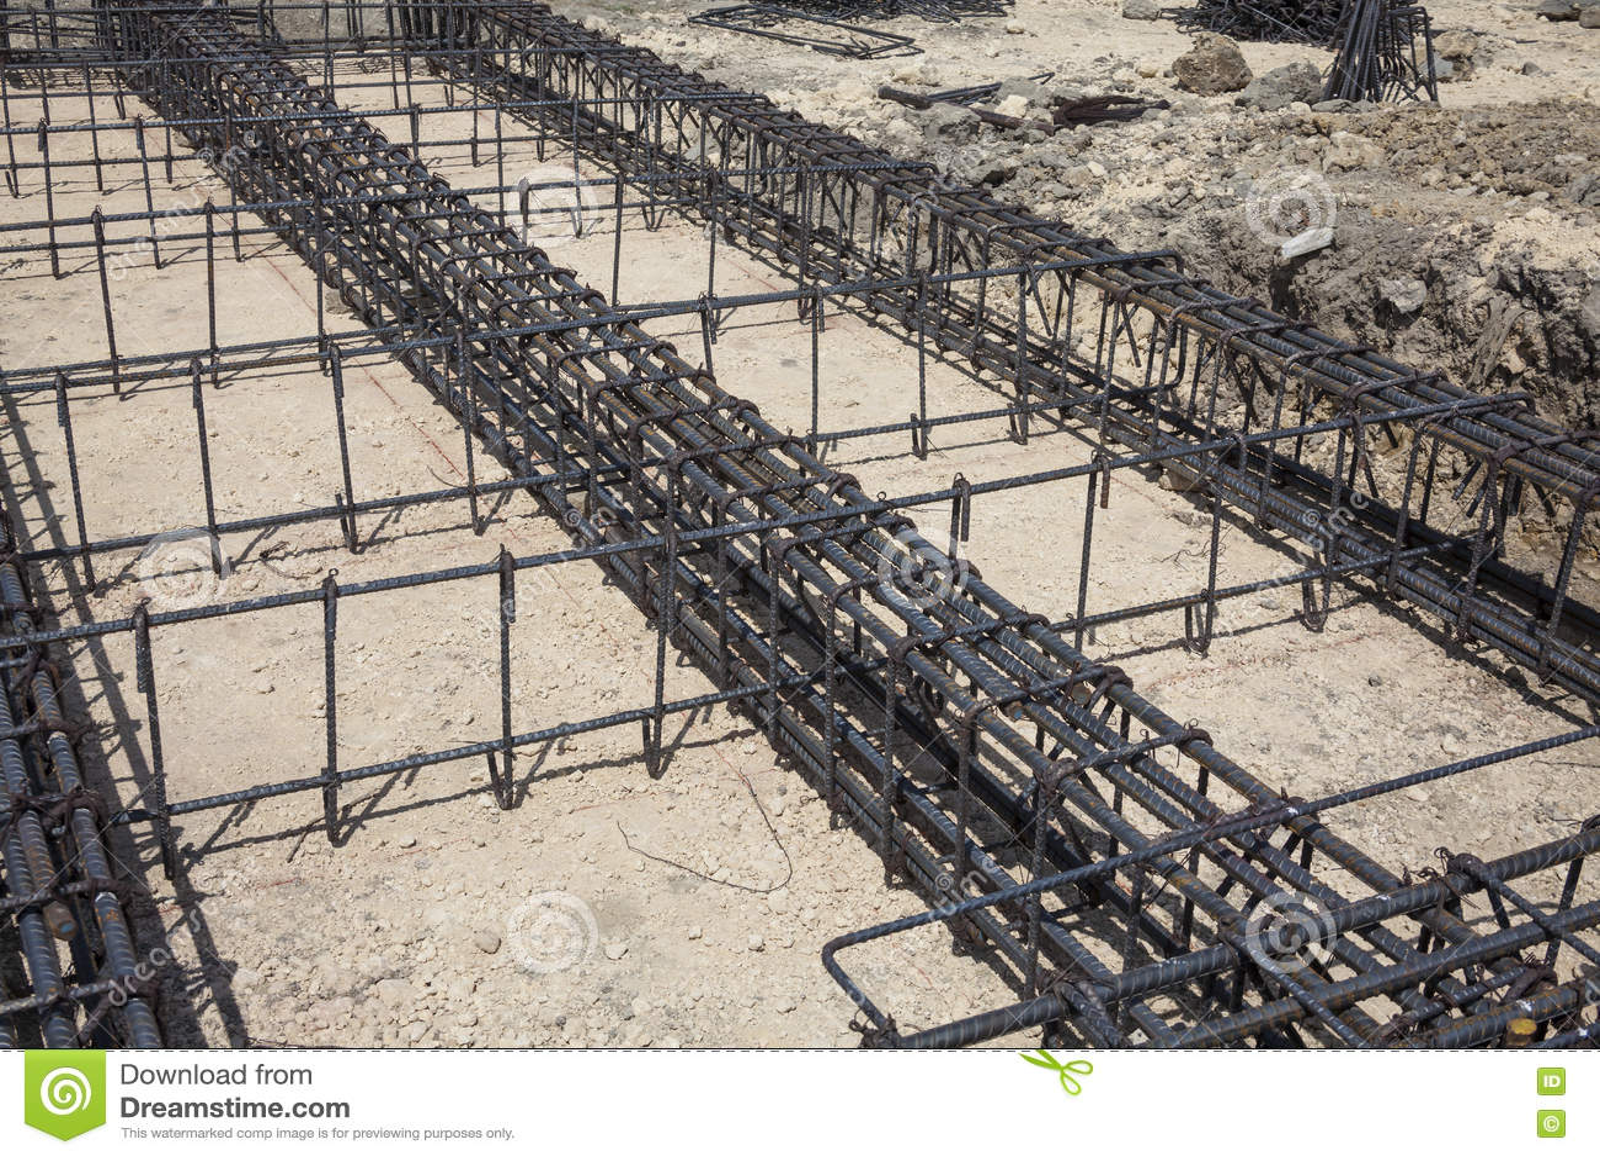 Iron framework stock photo. Image of framing, contractor - 70919698